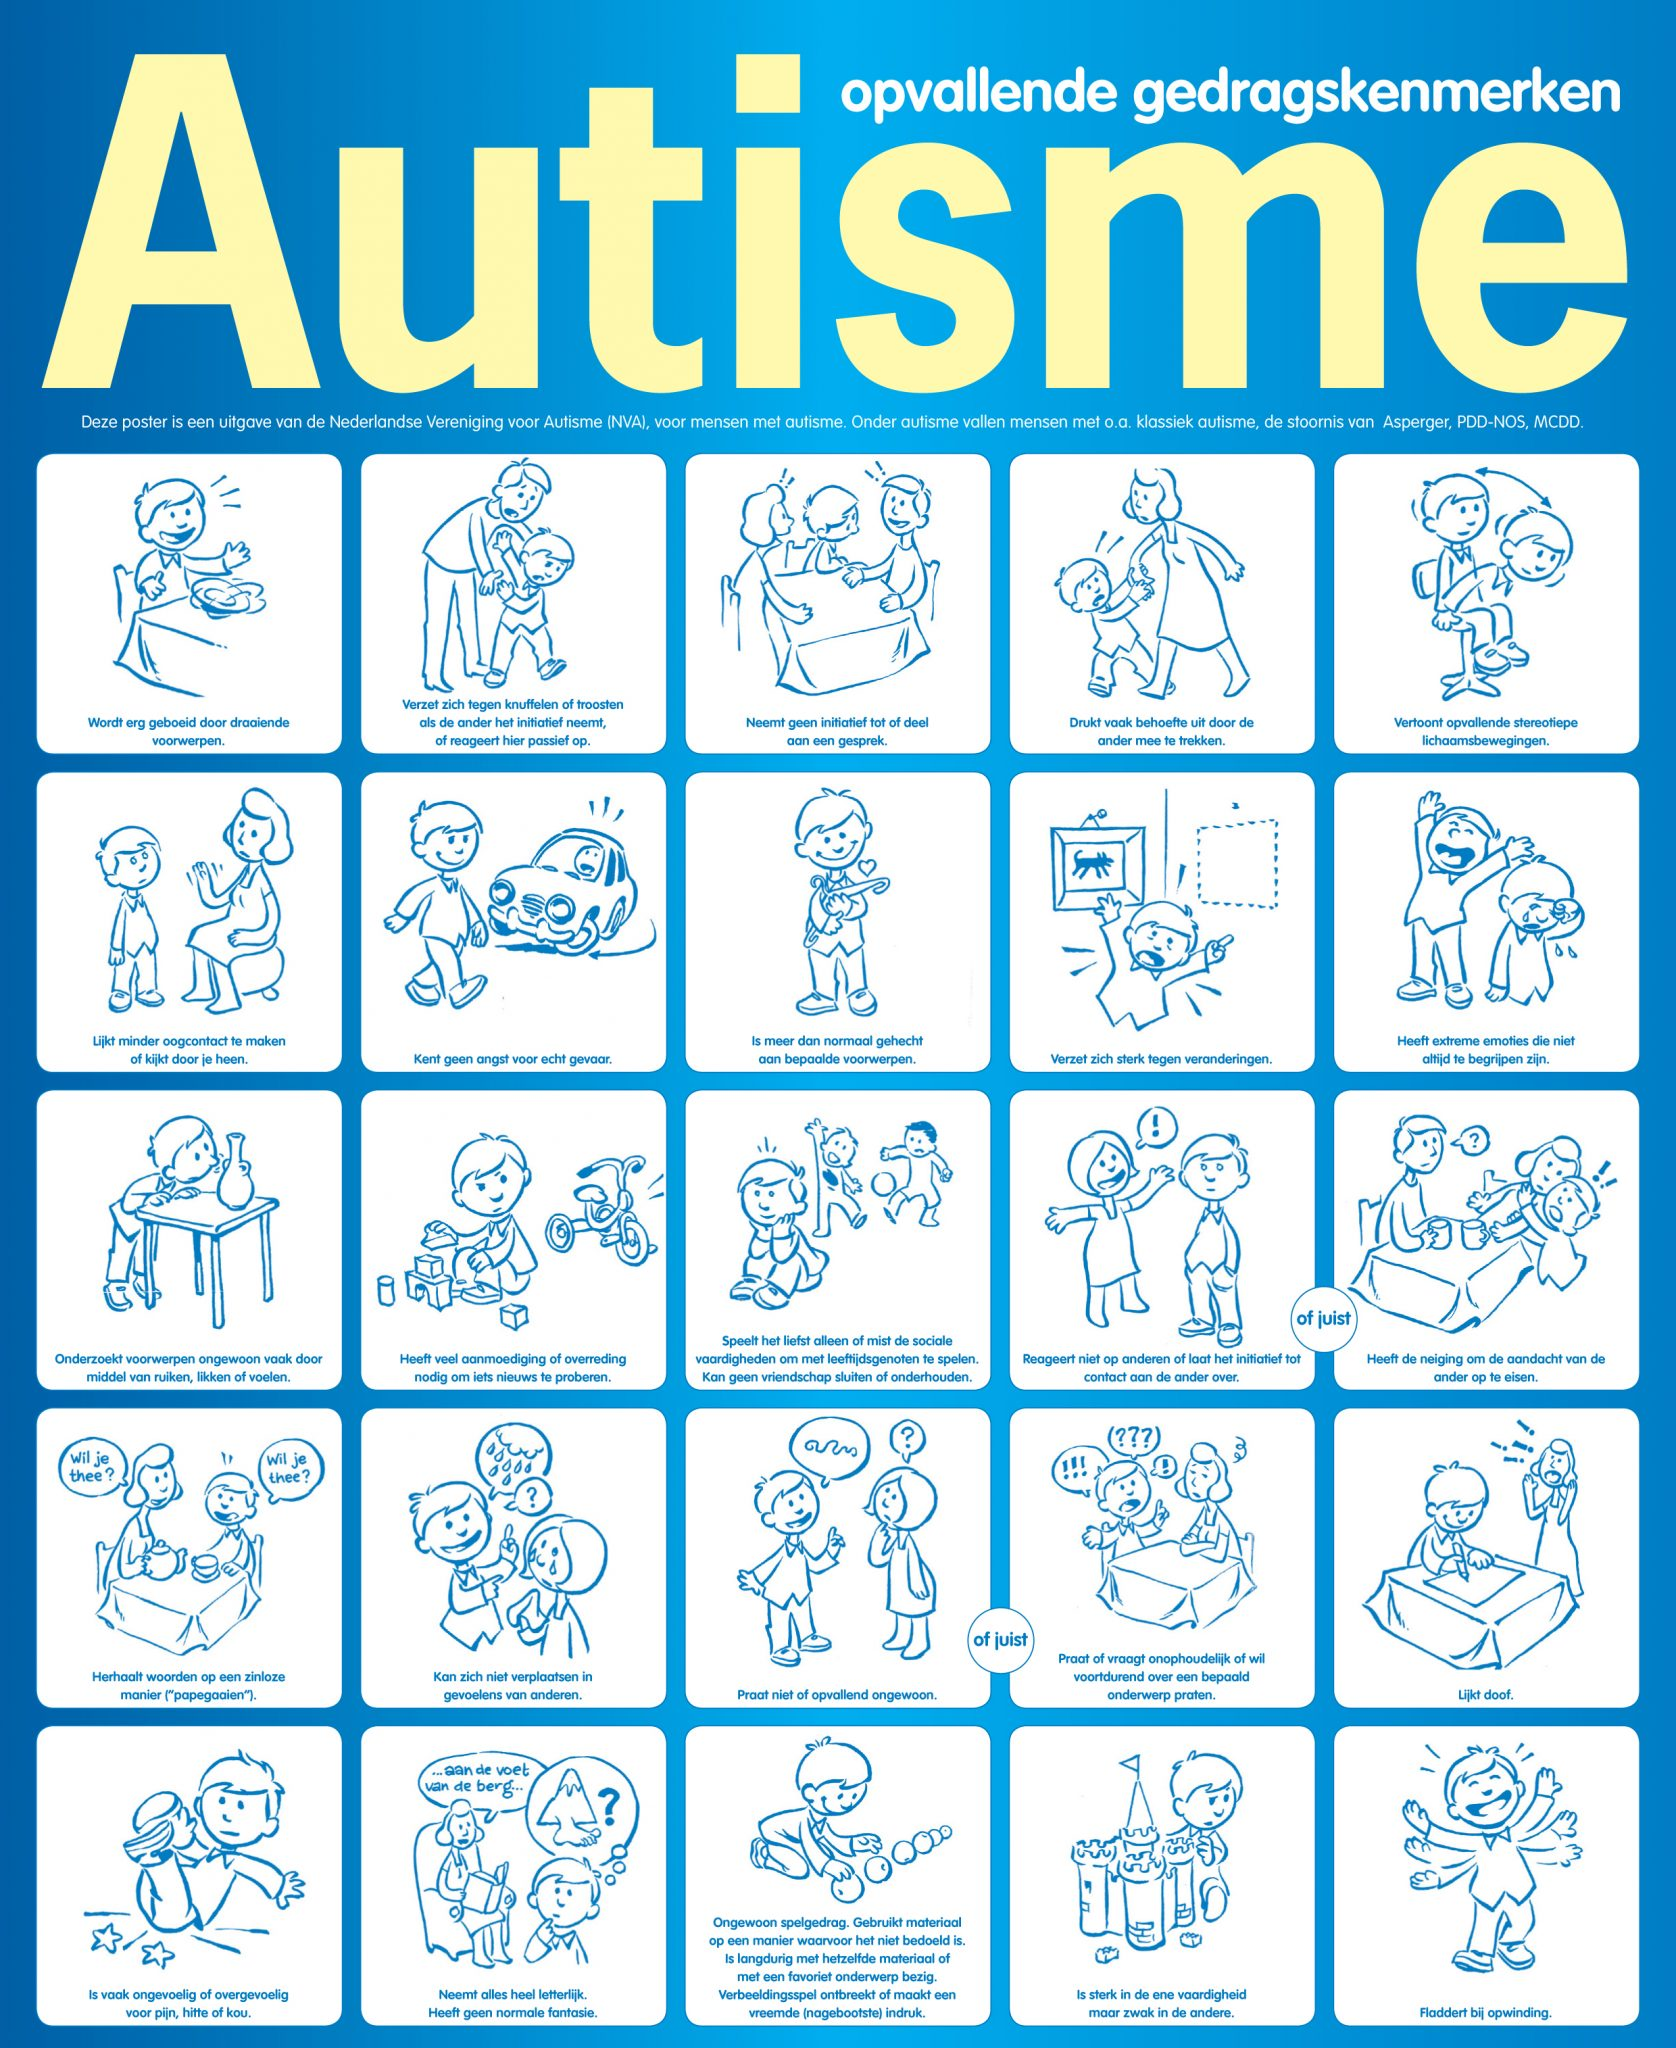 Bedwelming Poster opvallende gedragskenmerken autisme bij kinderen - NVA #RV94